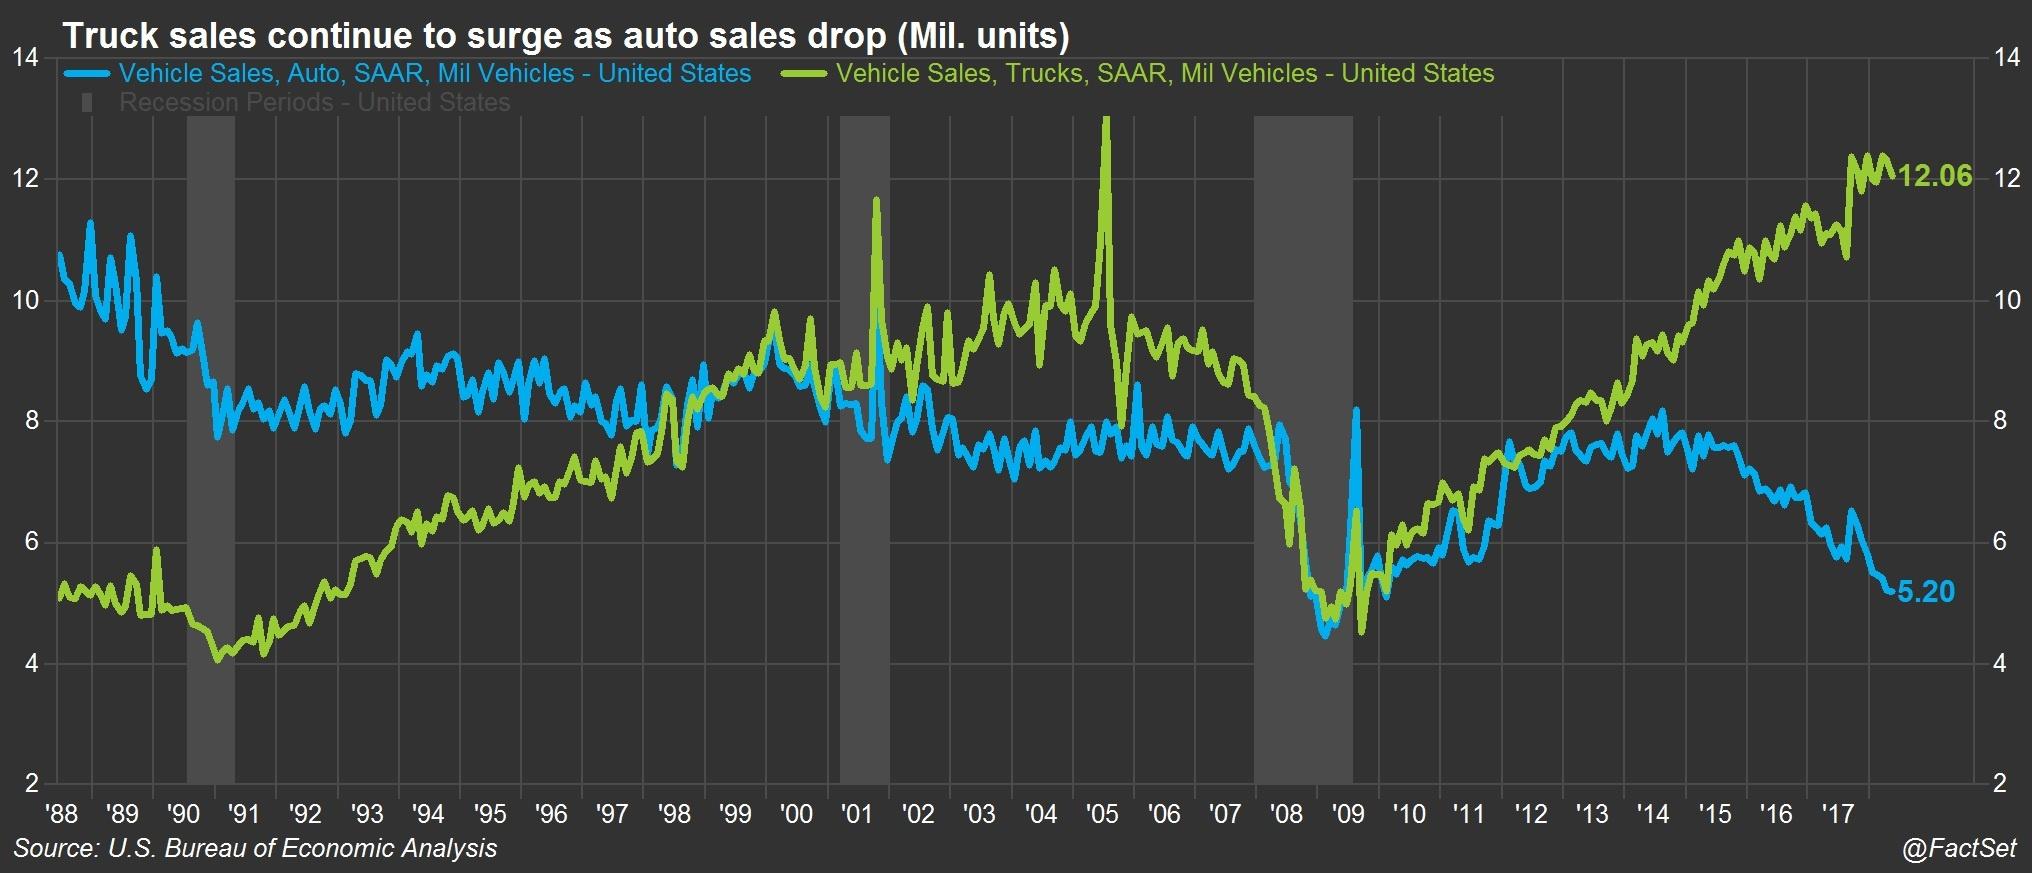 Truck sales continue to surge as auto sales drop